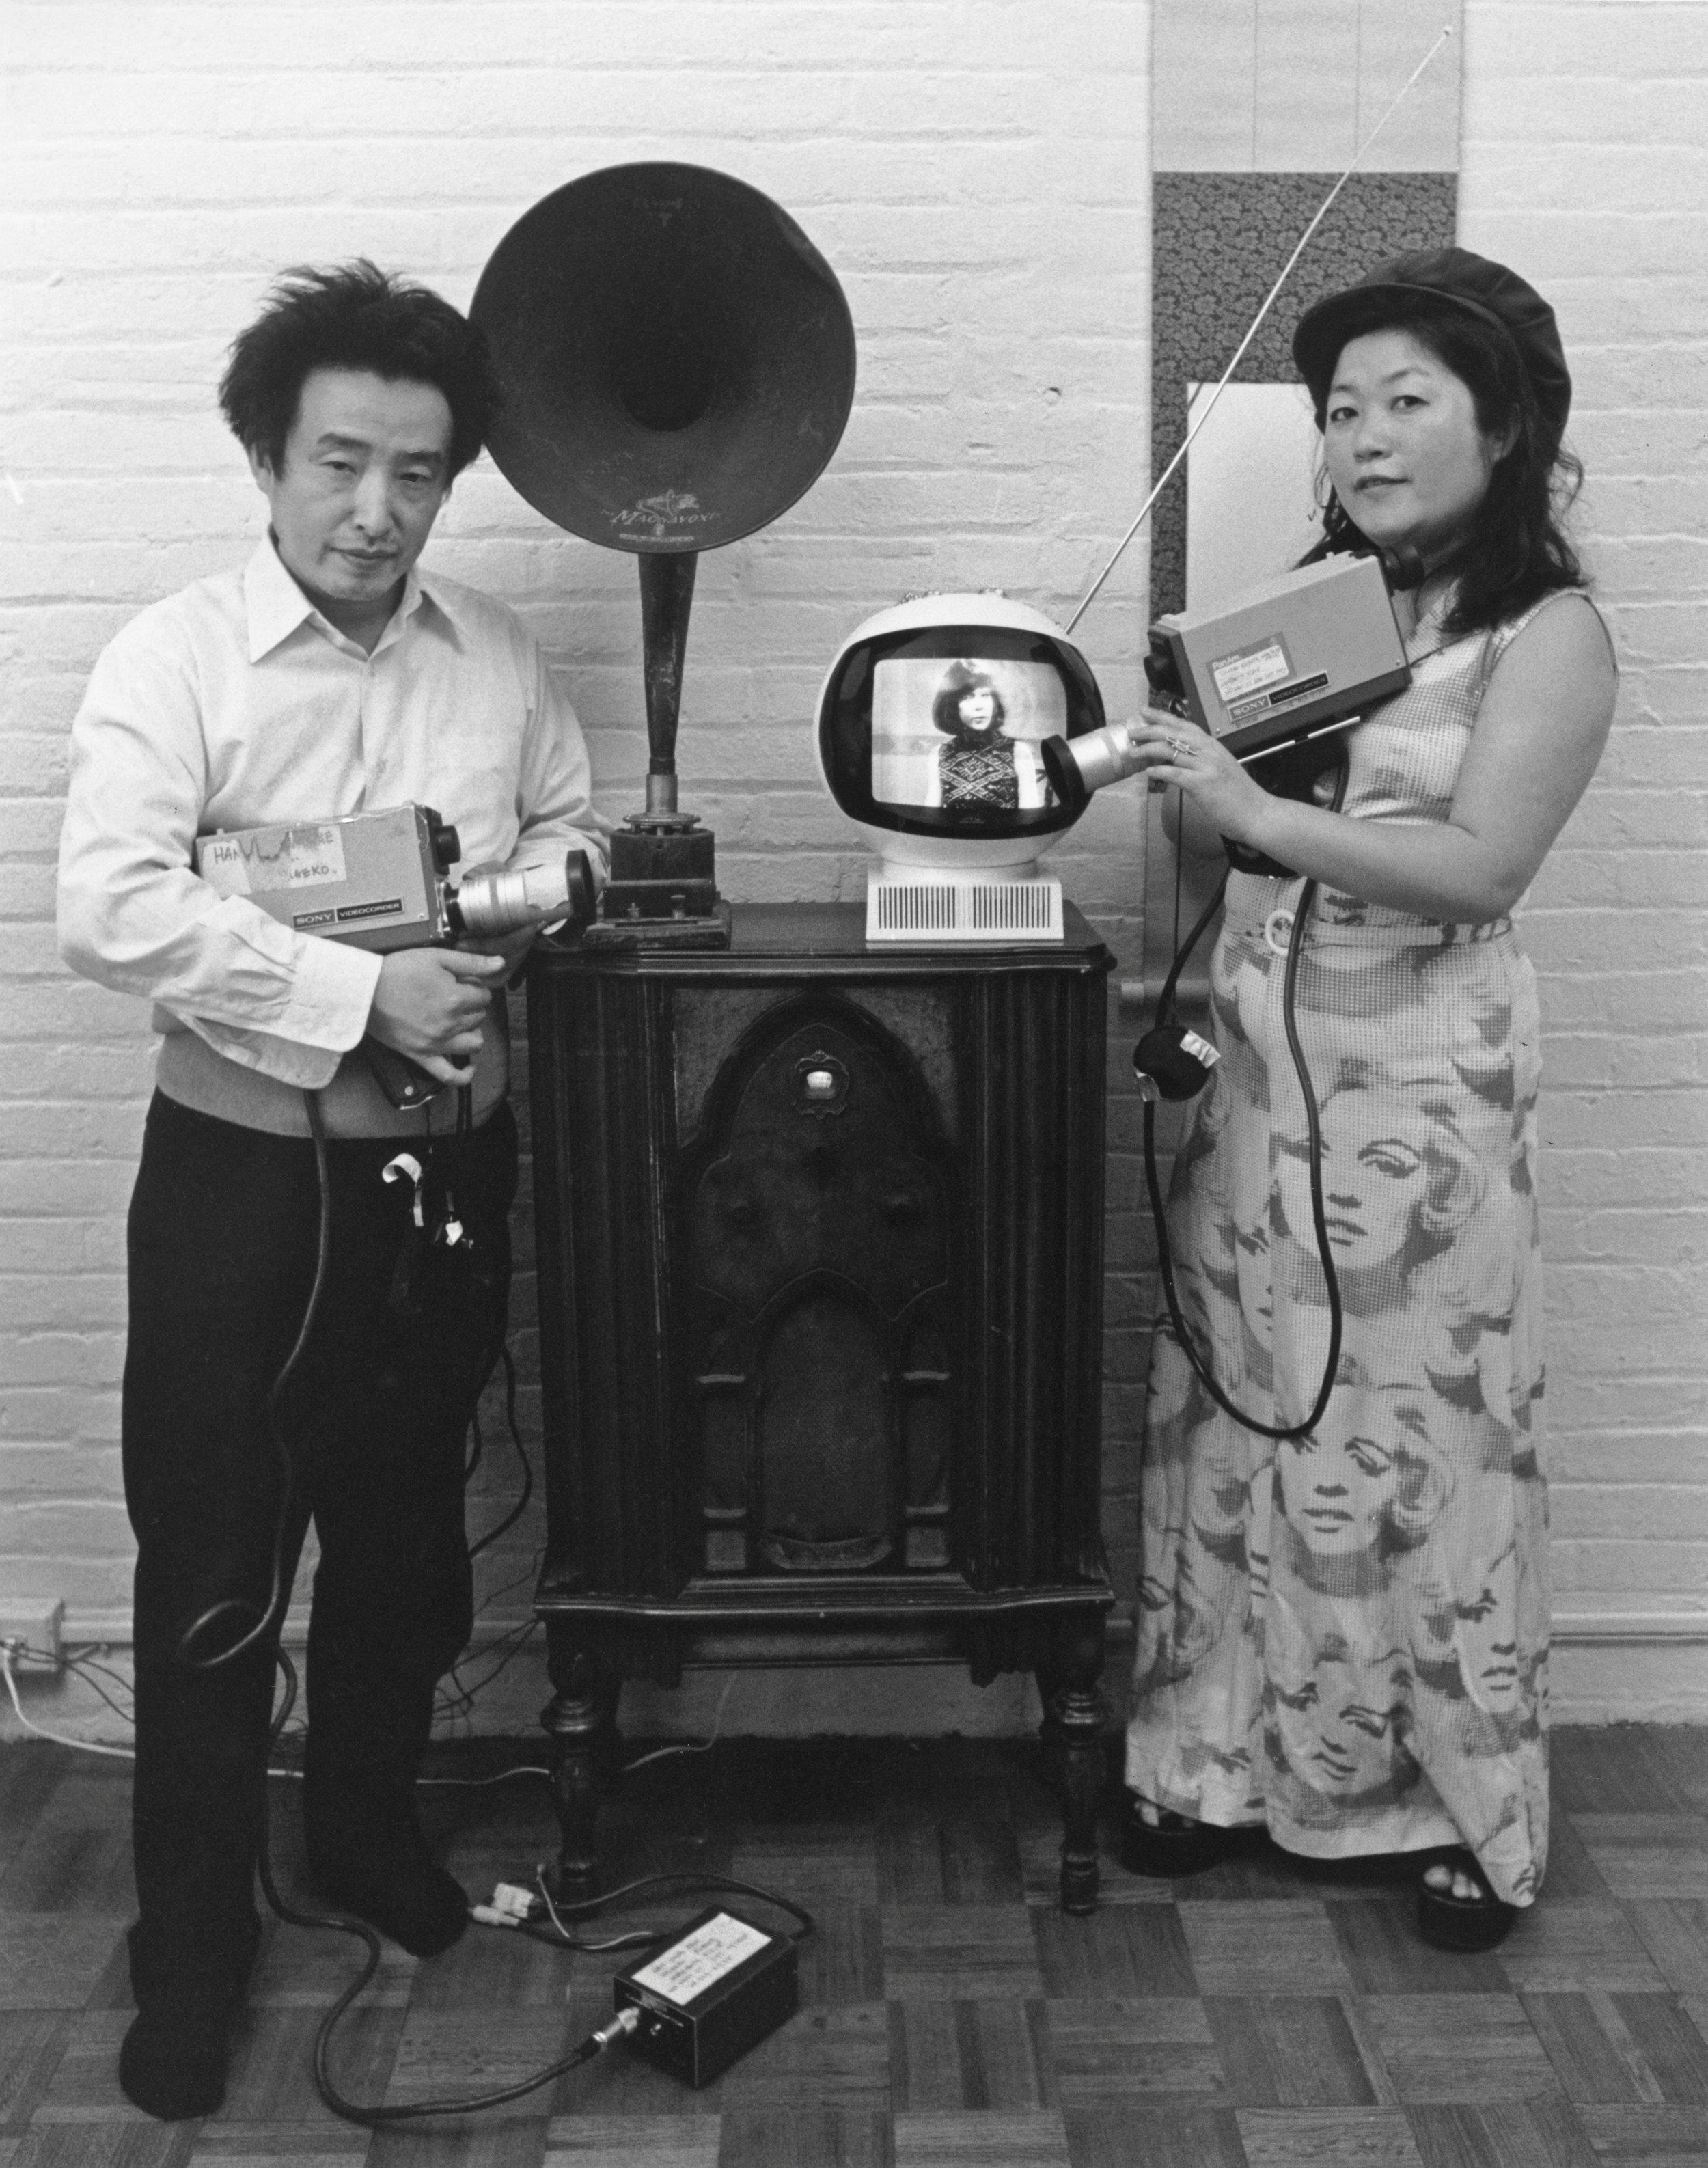 Tom Haar, Shigeko Kubota and Nam June Paik, 1974. ©Tom Haar